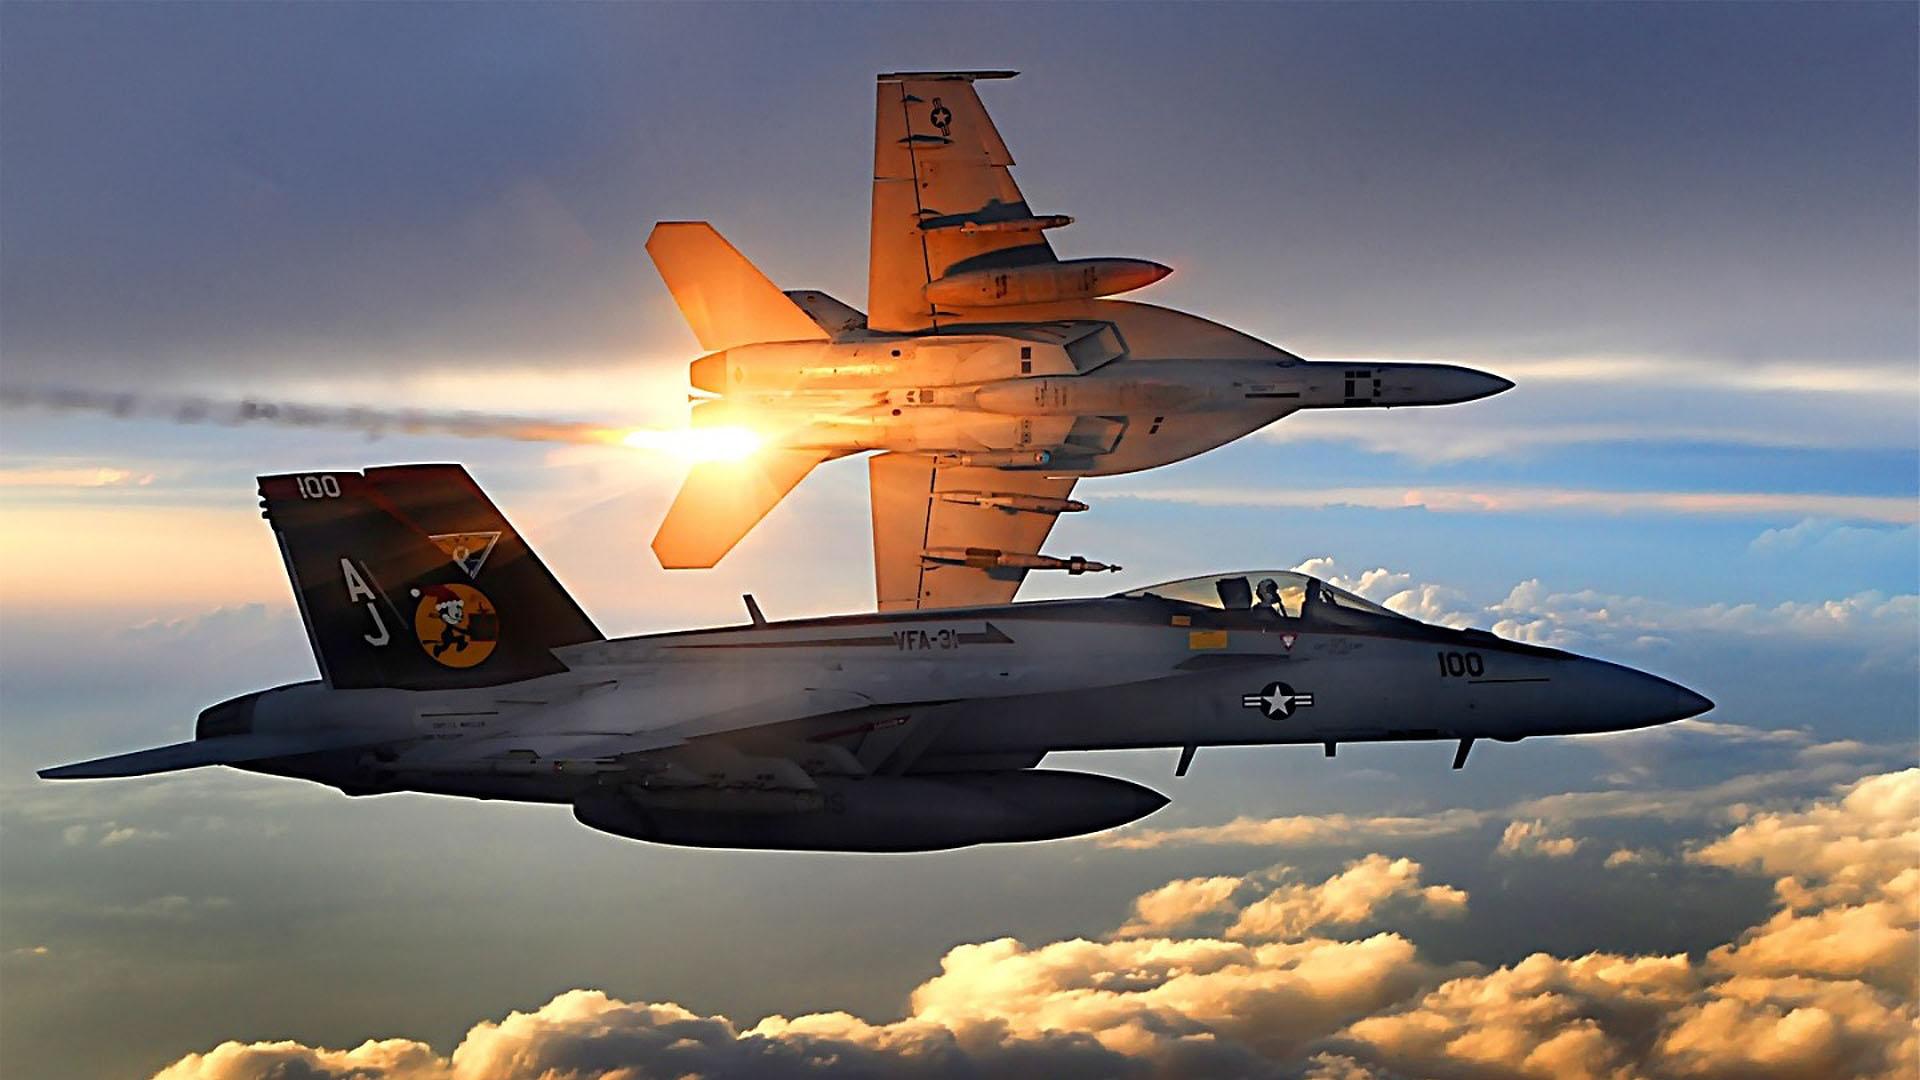 F 18 Super Hornet Wallpaper Super Hornet Wallpaper